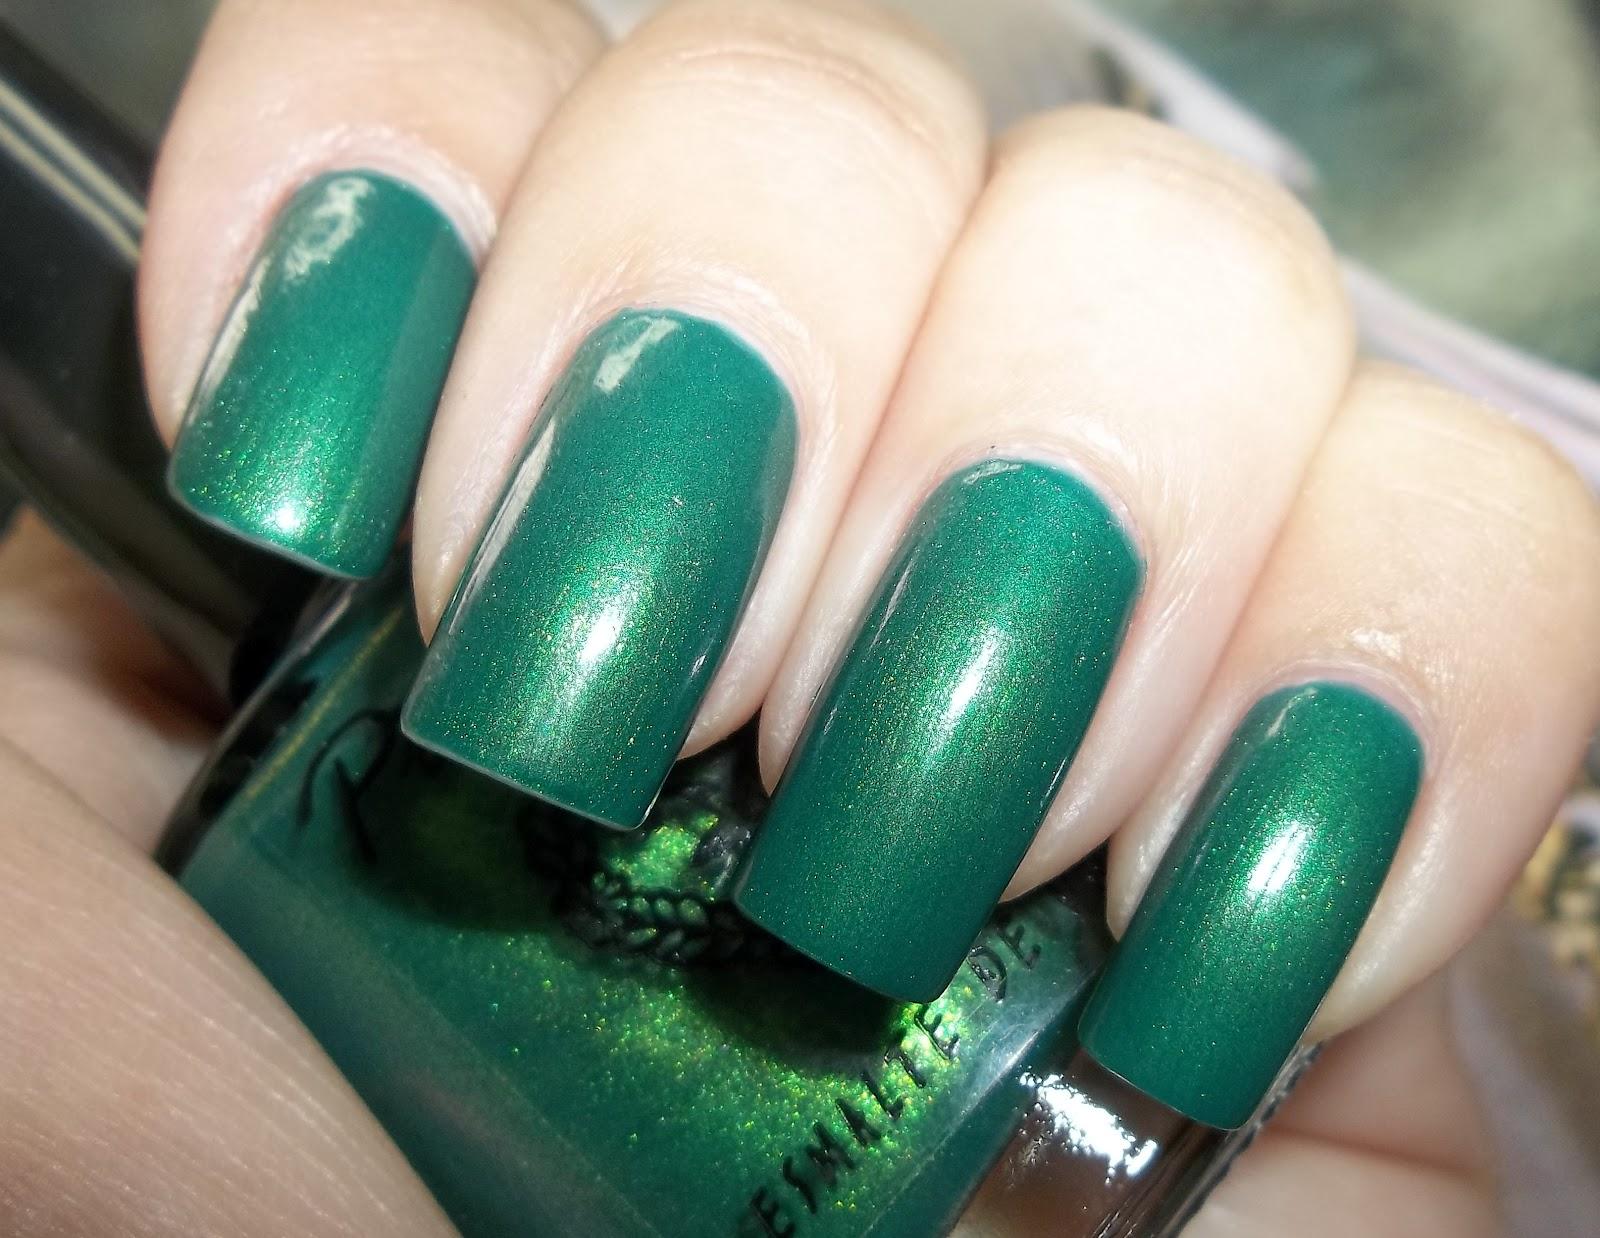 Increíble Uñas Verdes Y Rosas Motivo - Ideas Para Pintar Uñas - knxc ...